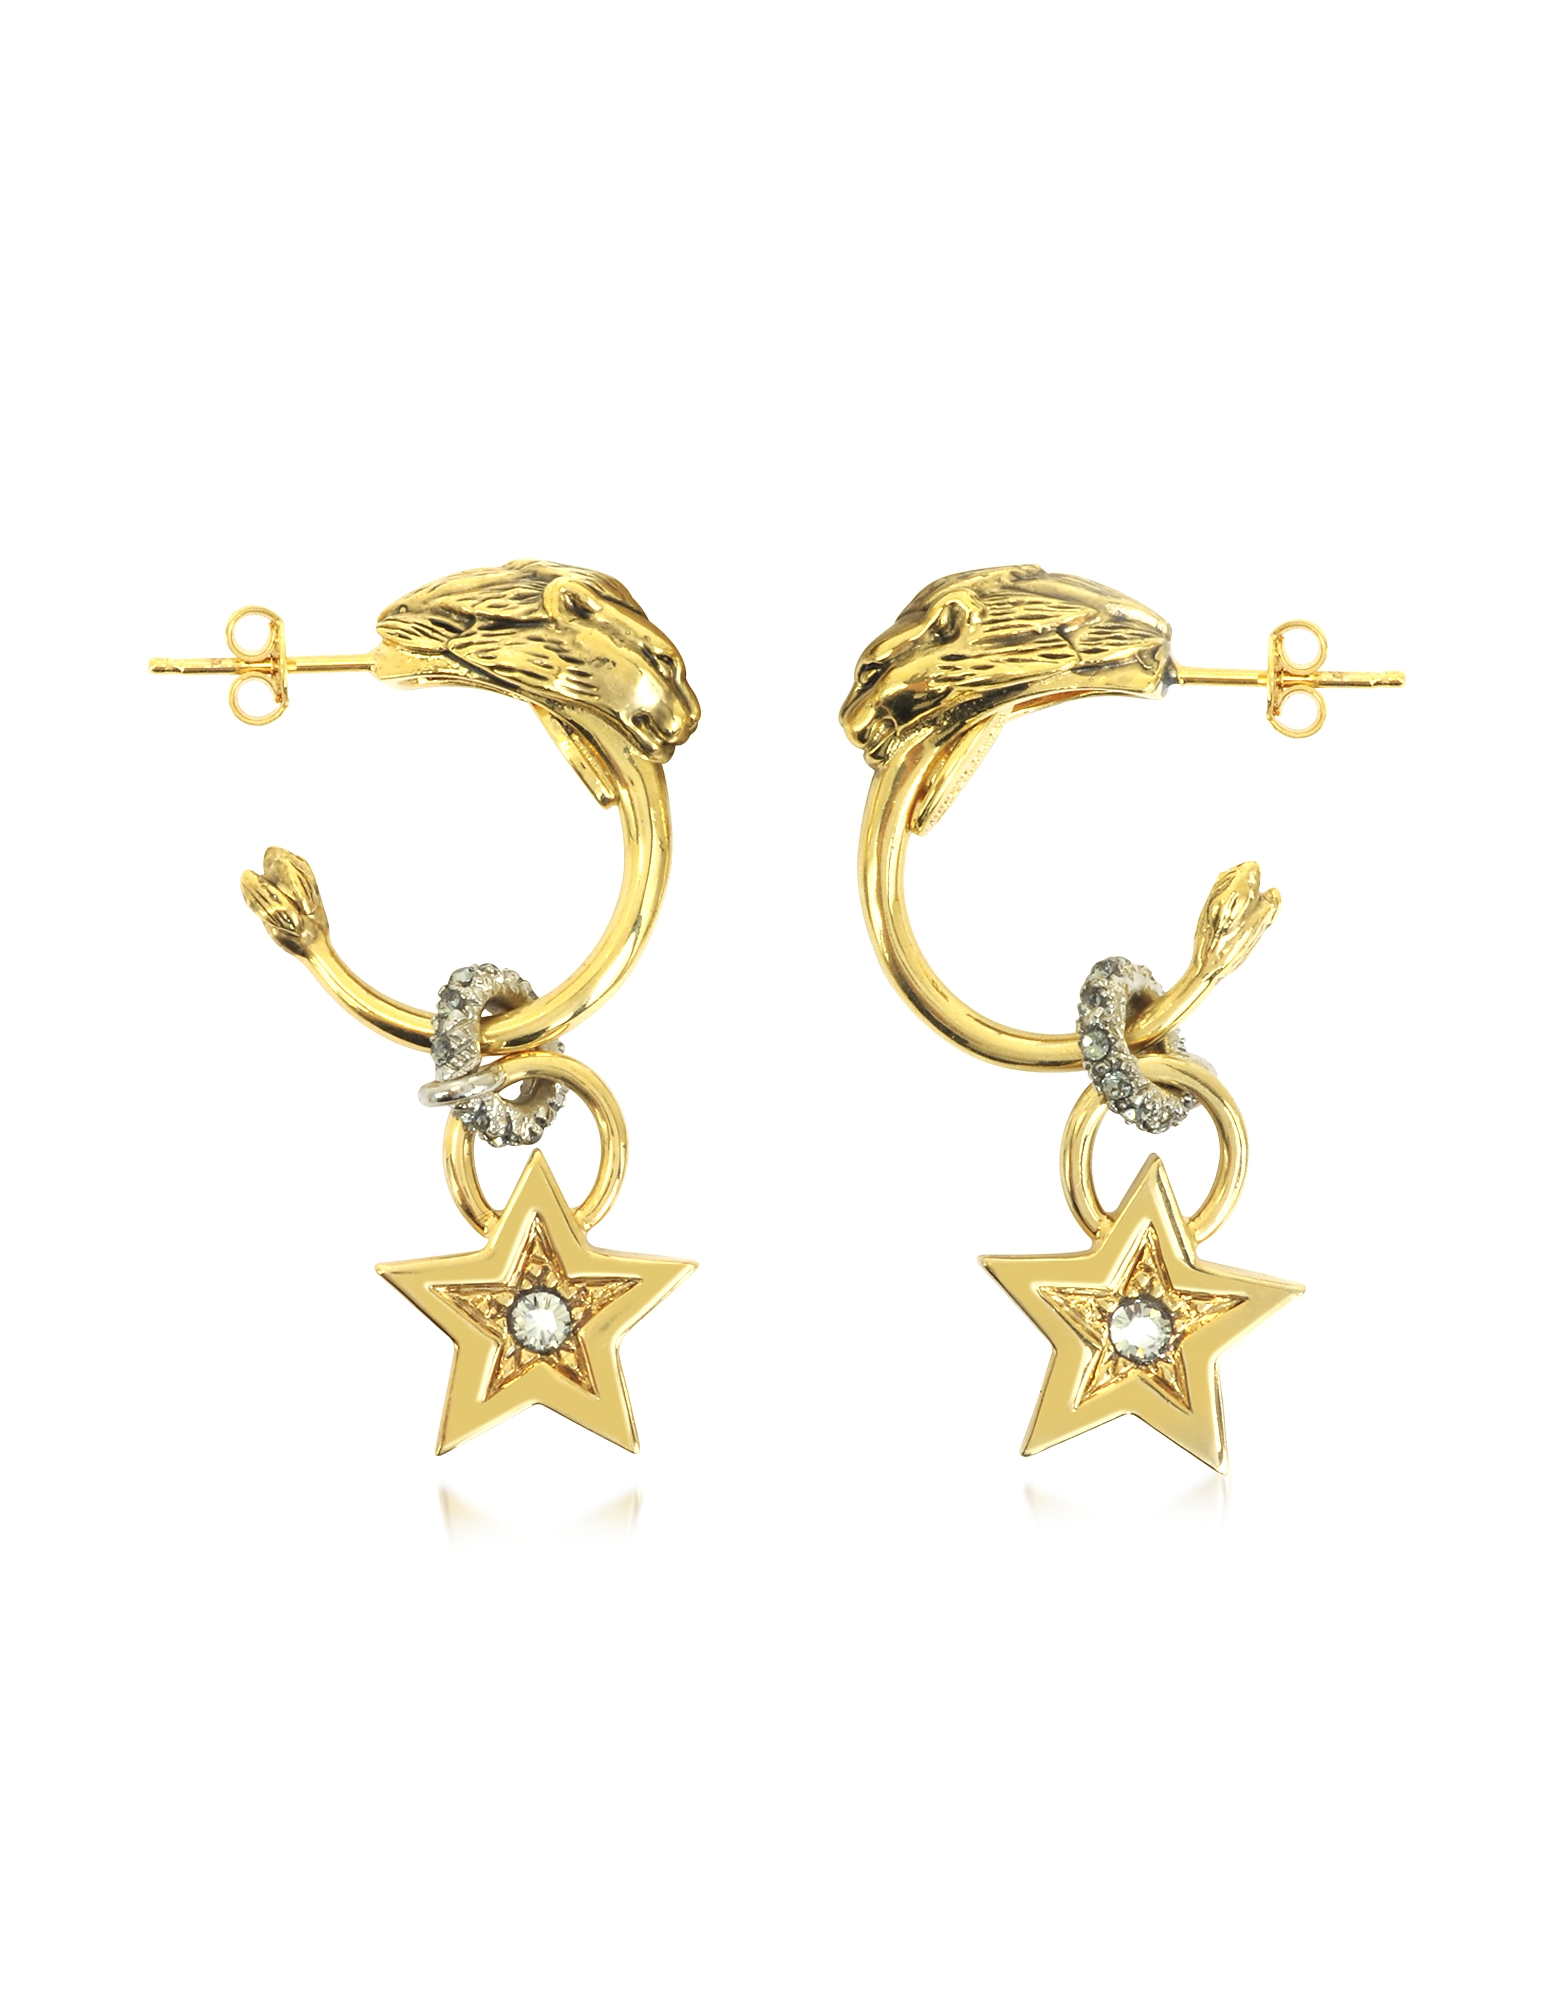 Roberto Cavalli Earrings, Circus Golden Metal Earrings w/Crystals